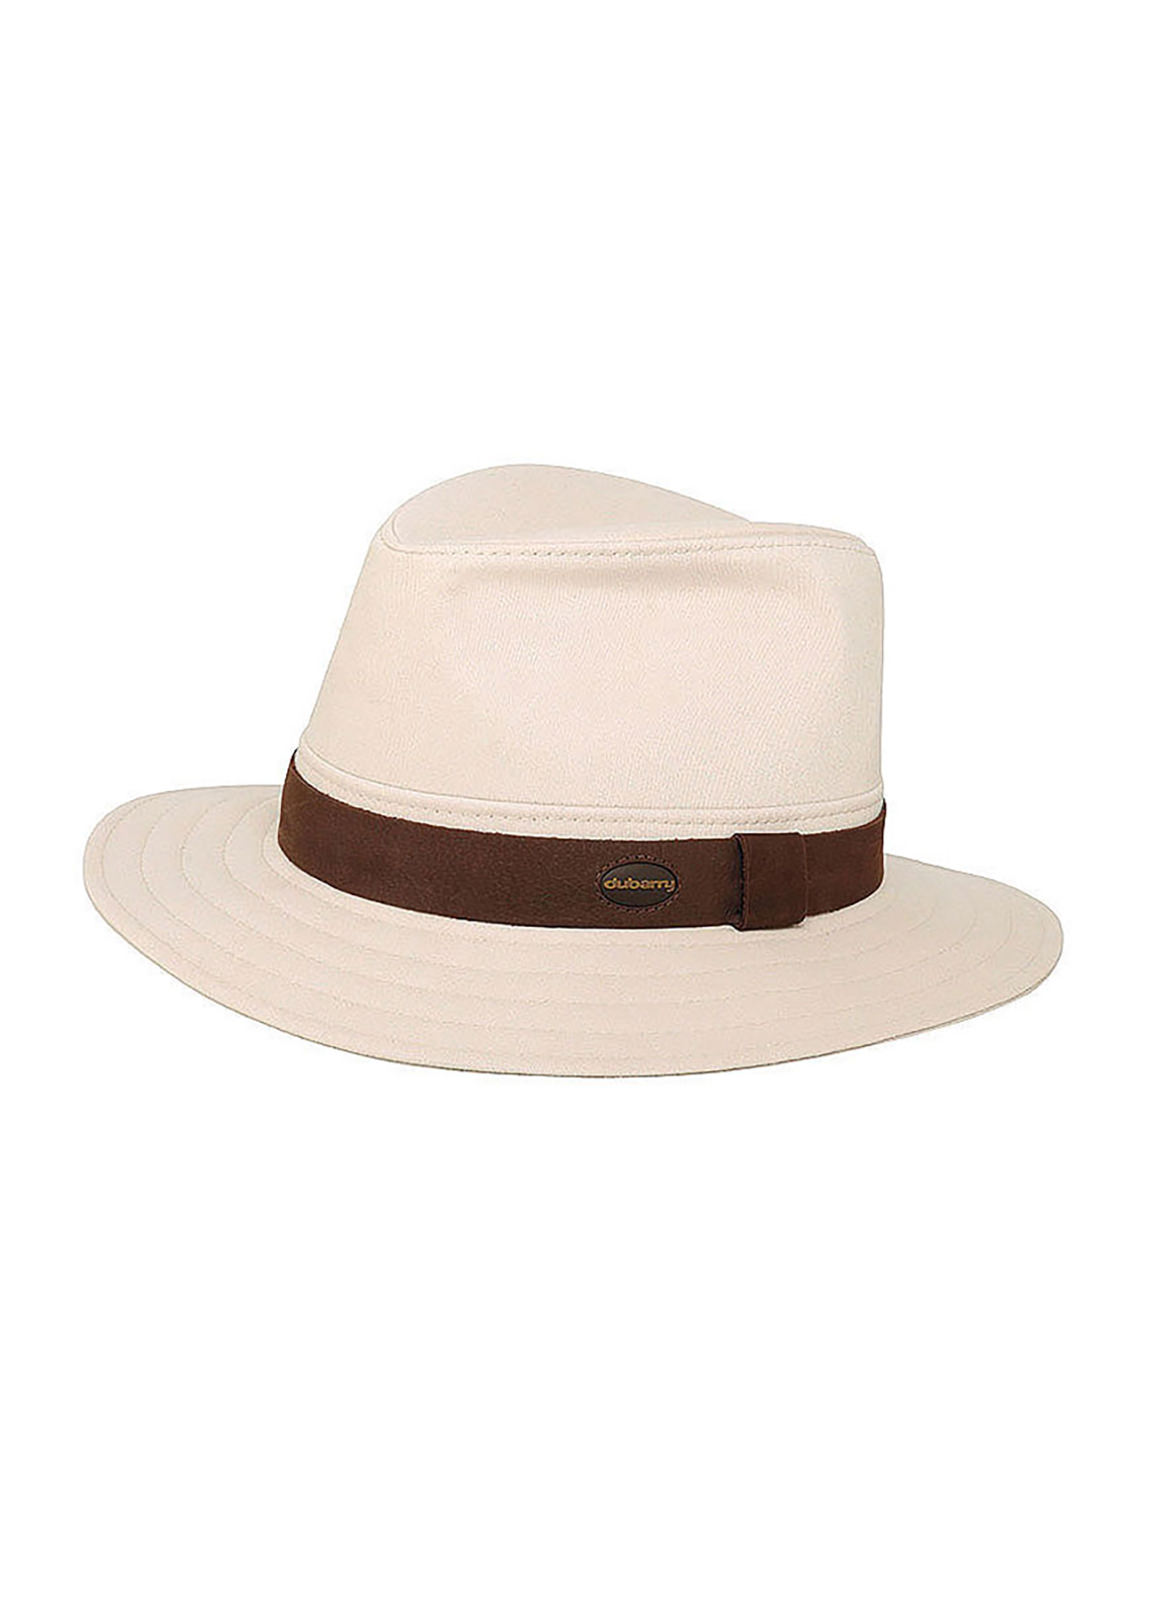 Dubarry_ Robert Fedora style hat - Stone_Image_1